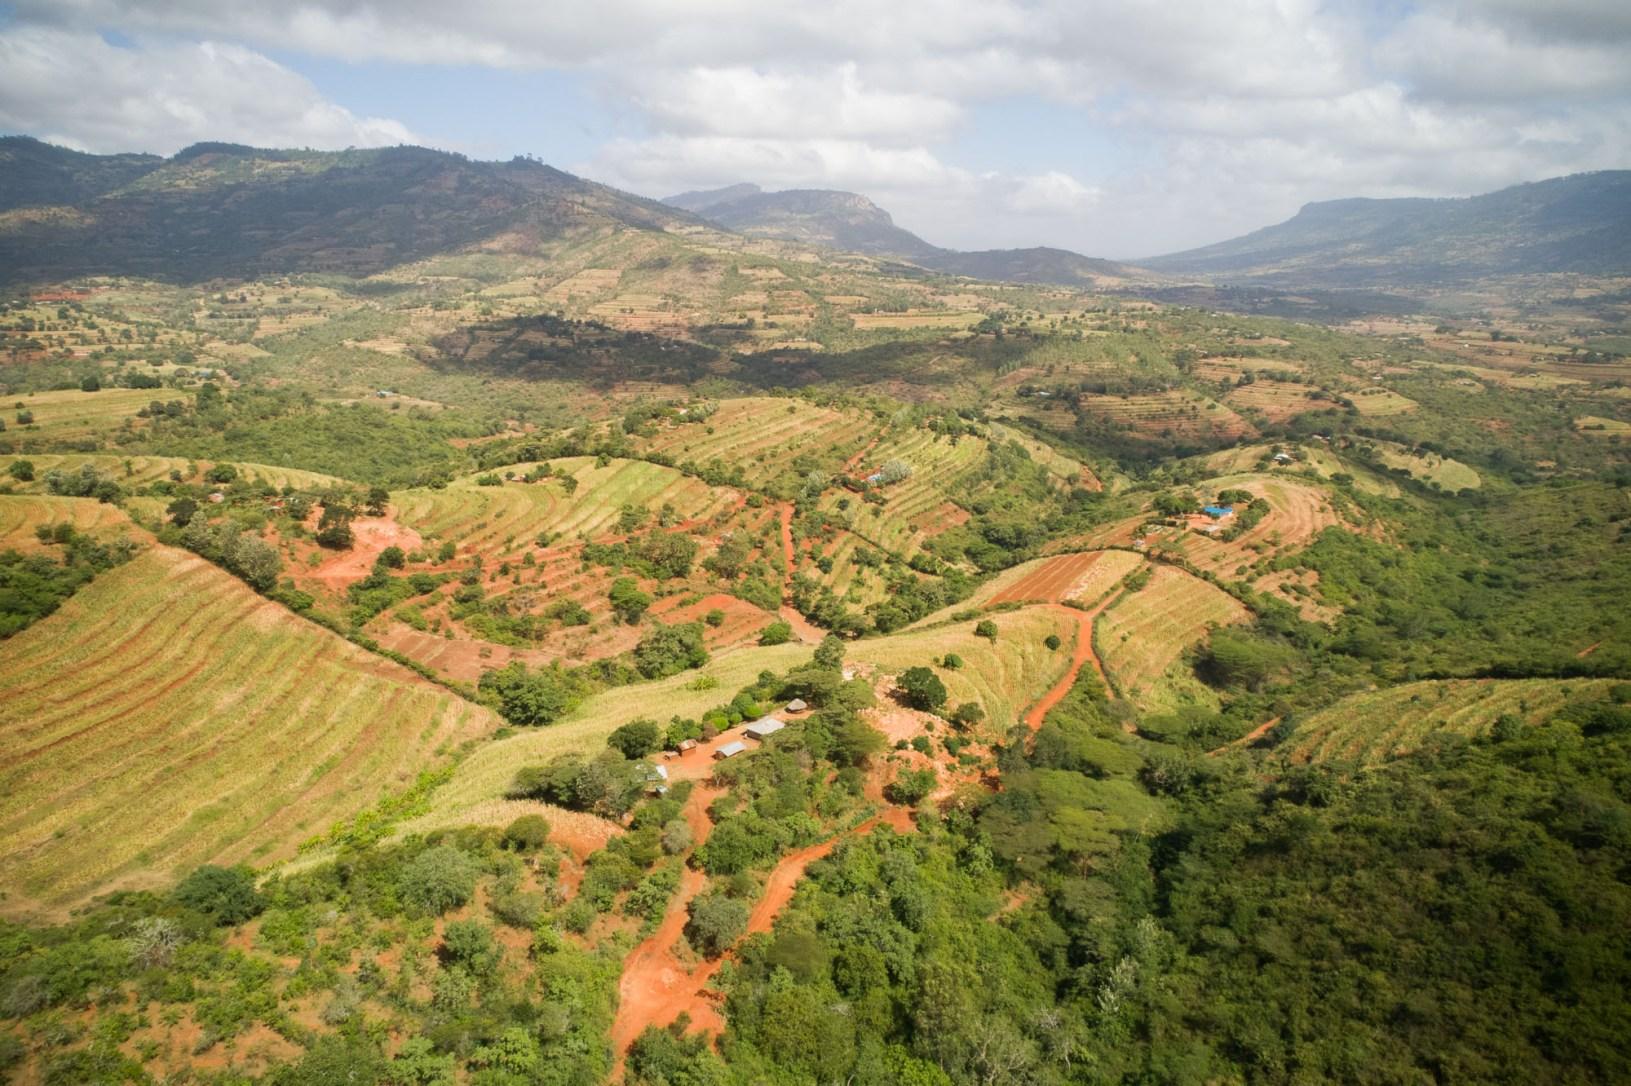 Makueni County, Kenya is home to rolling hills and arid farmland.